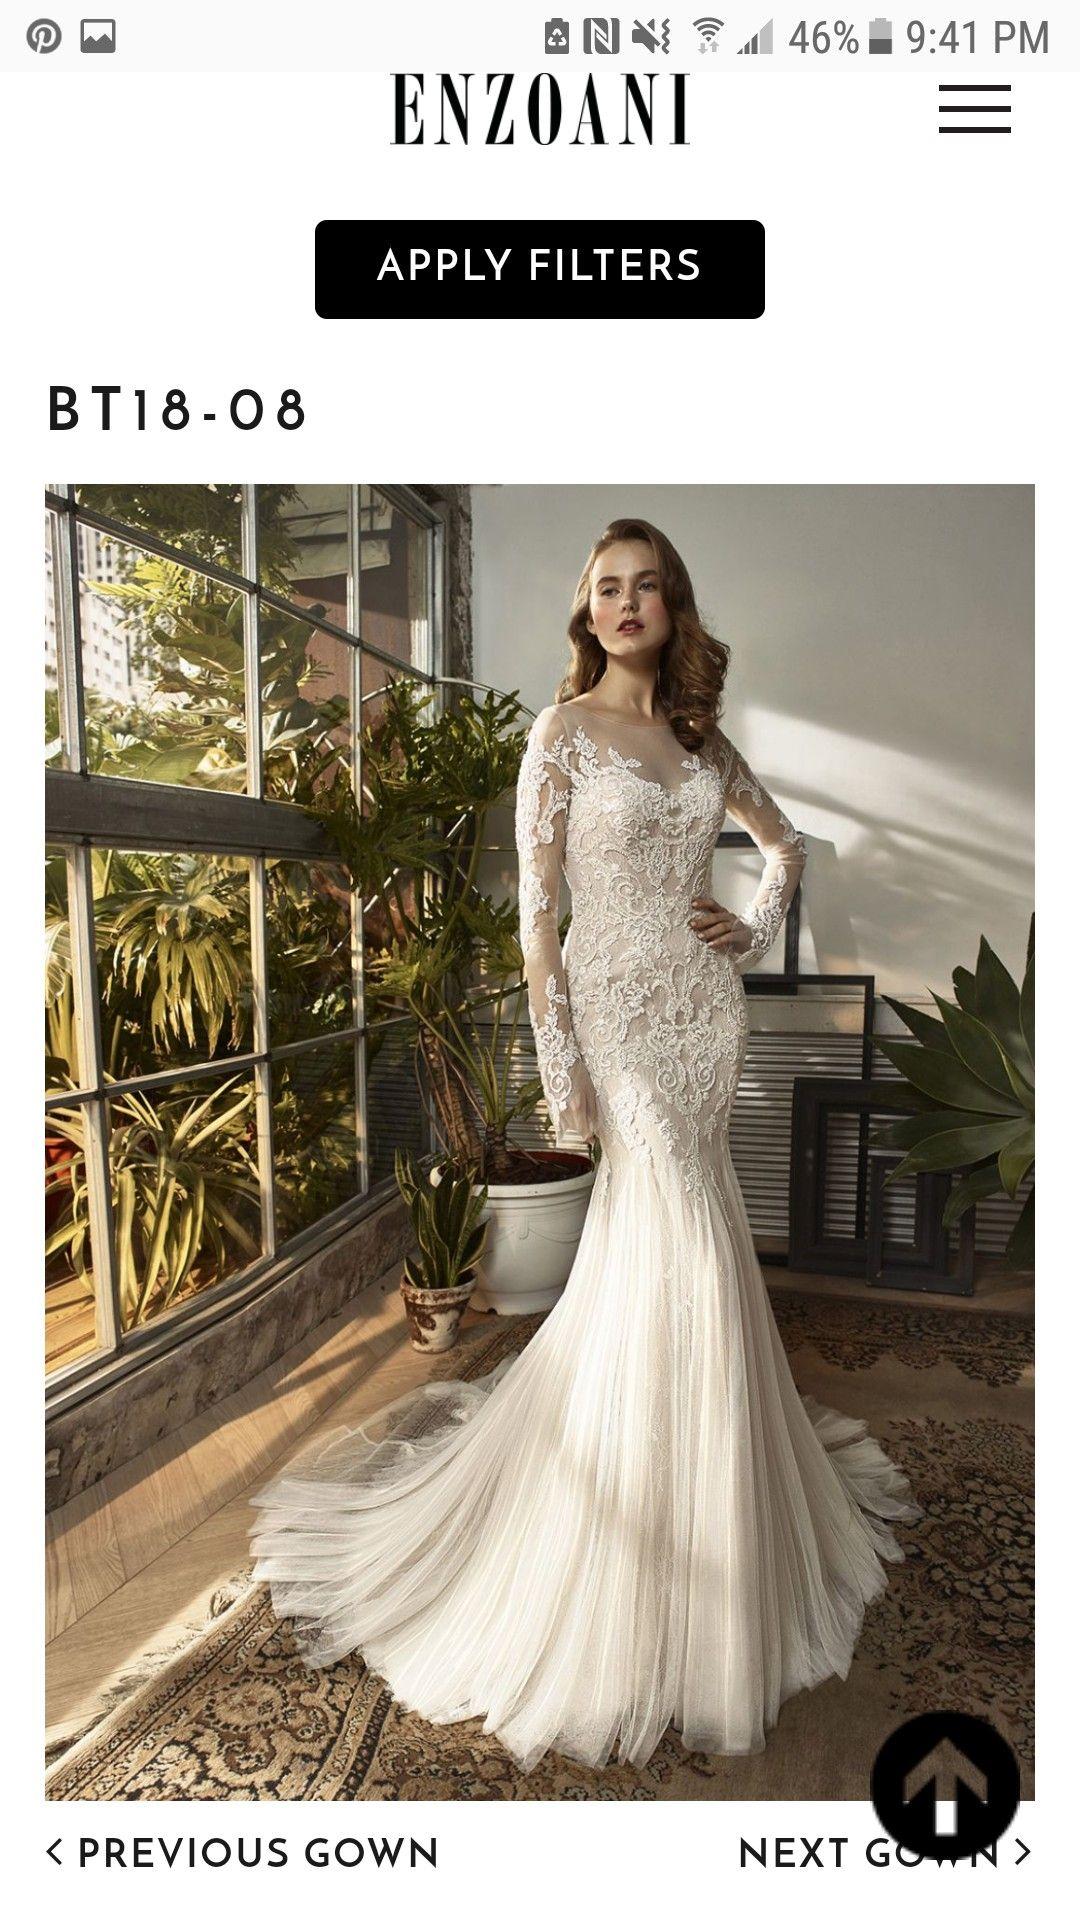 Lace wedding dress tulle november 2018 Pin by Katelynn Stout on Wedding Ideas  Pinterest  Wedding